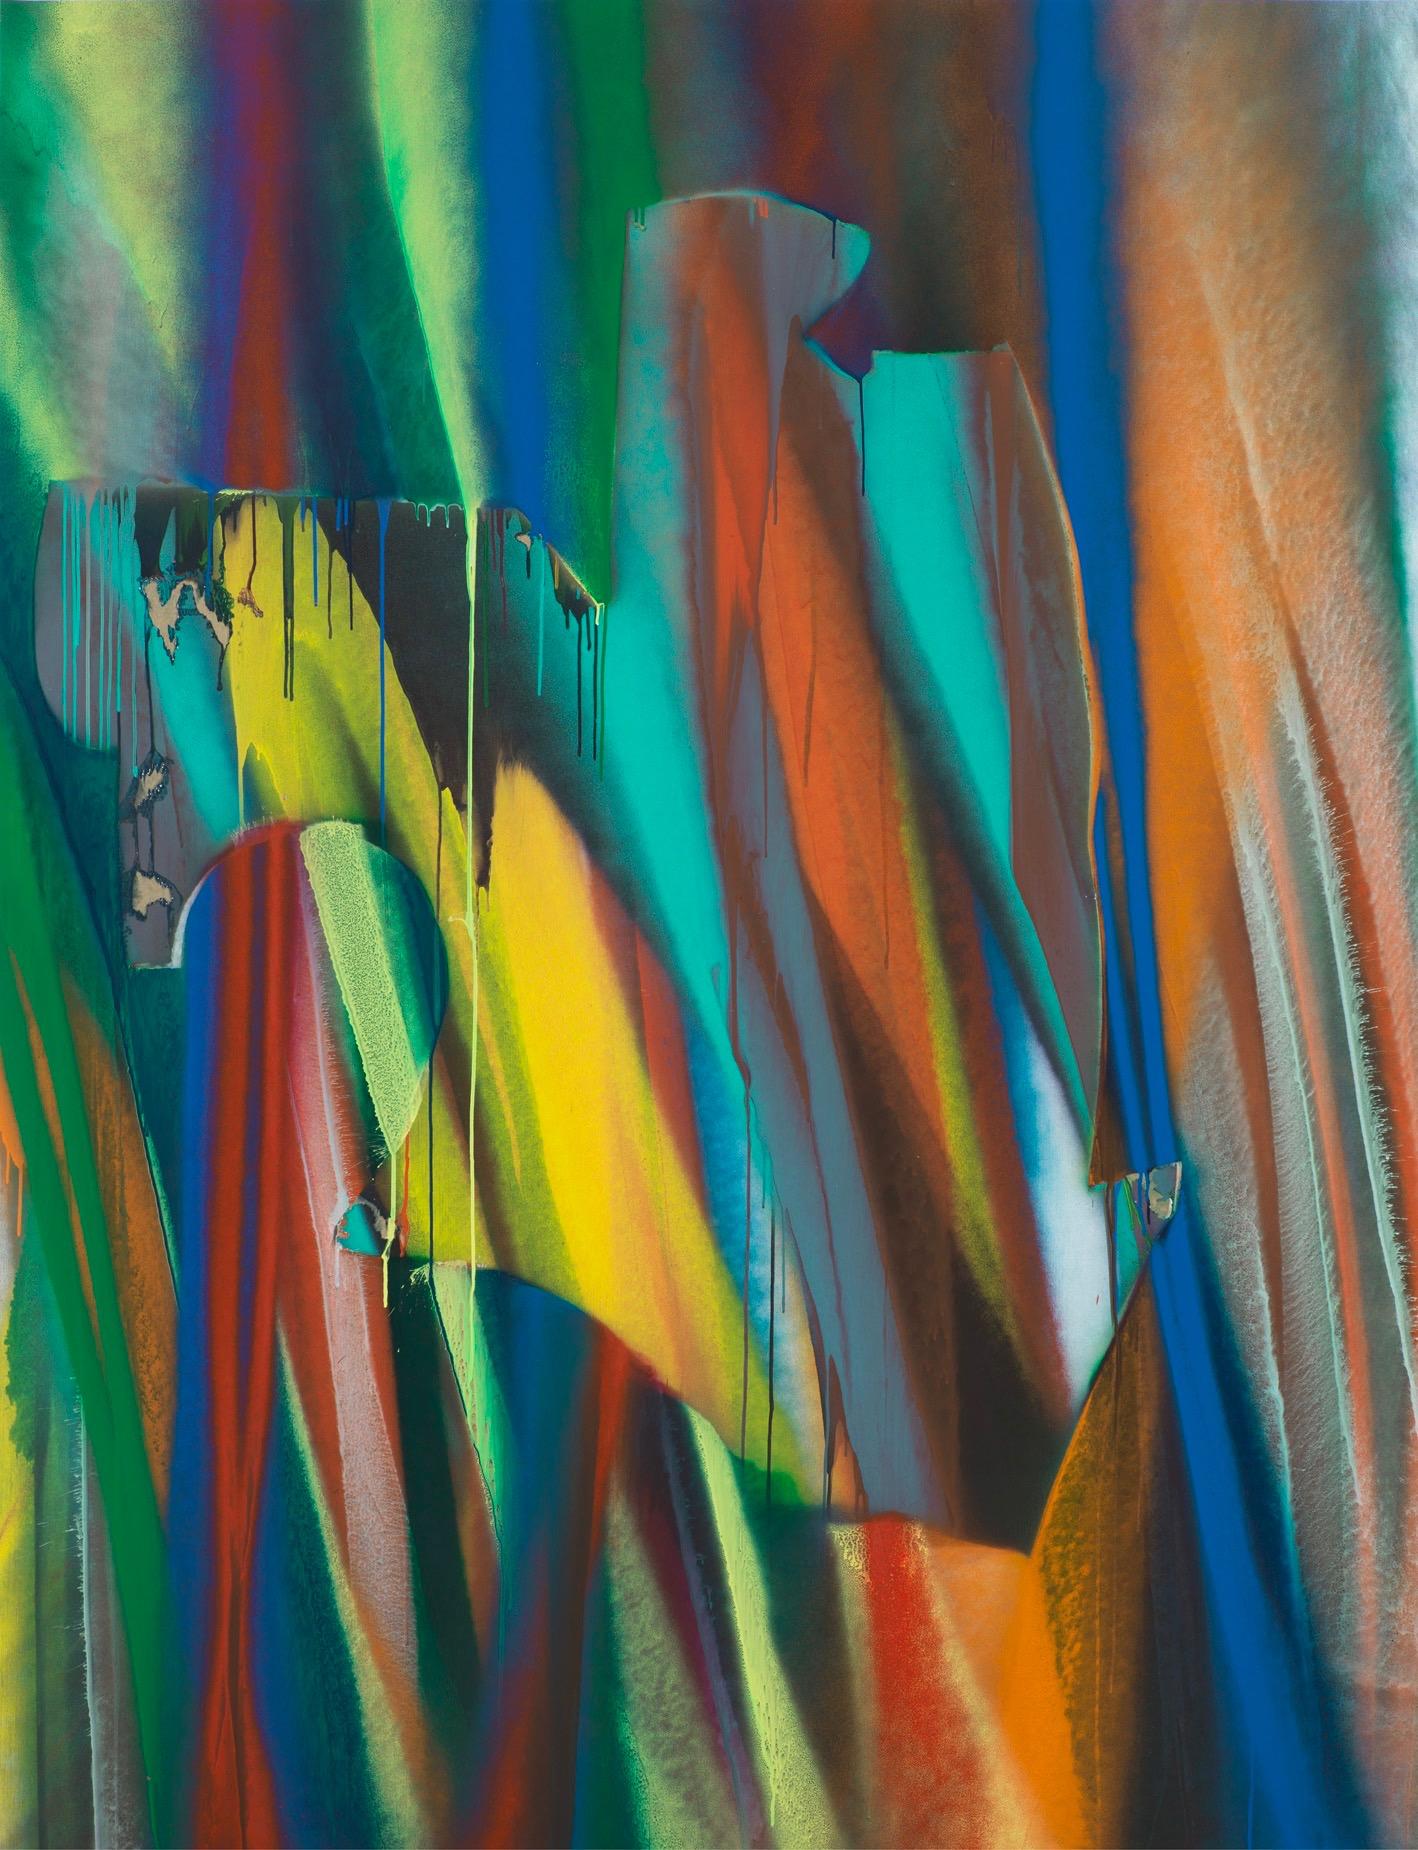 Katharina Grosse Untitled, 2016 Acrylic on canvas © Katharina Grosse und VG Bild-Kunst, Bonn 2016. Photo by Jens Ziehe. Courtesy Gagosian